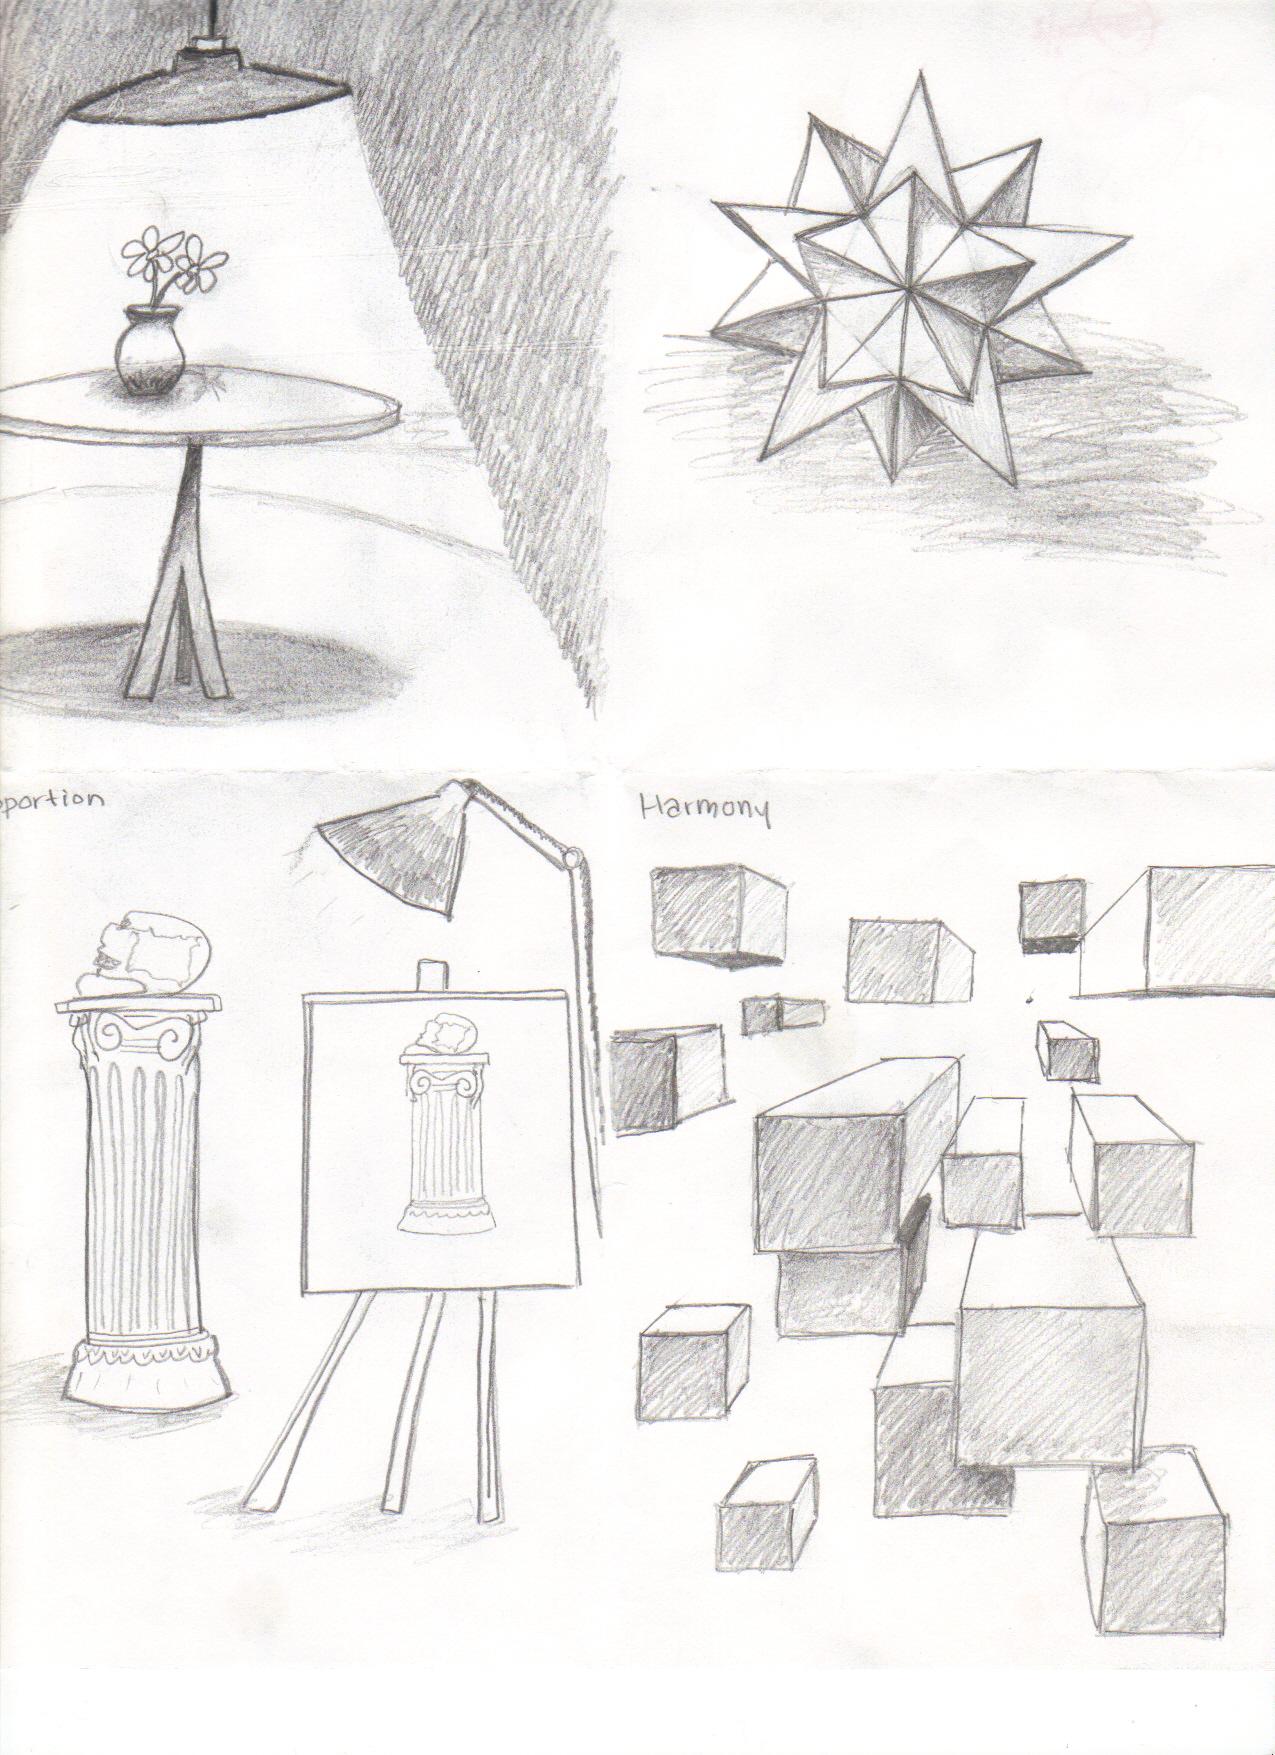 Elements and principles of design essay